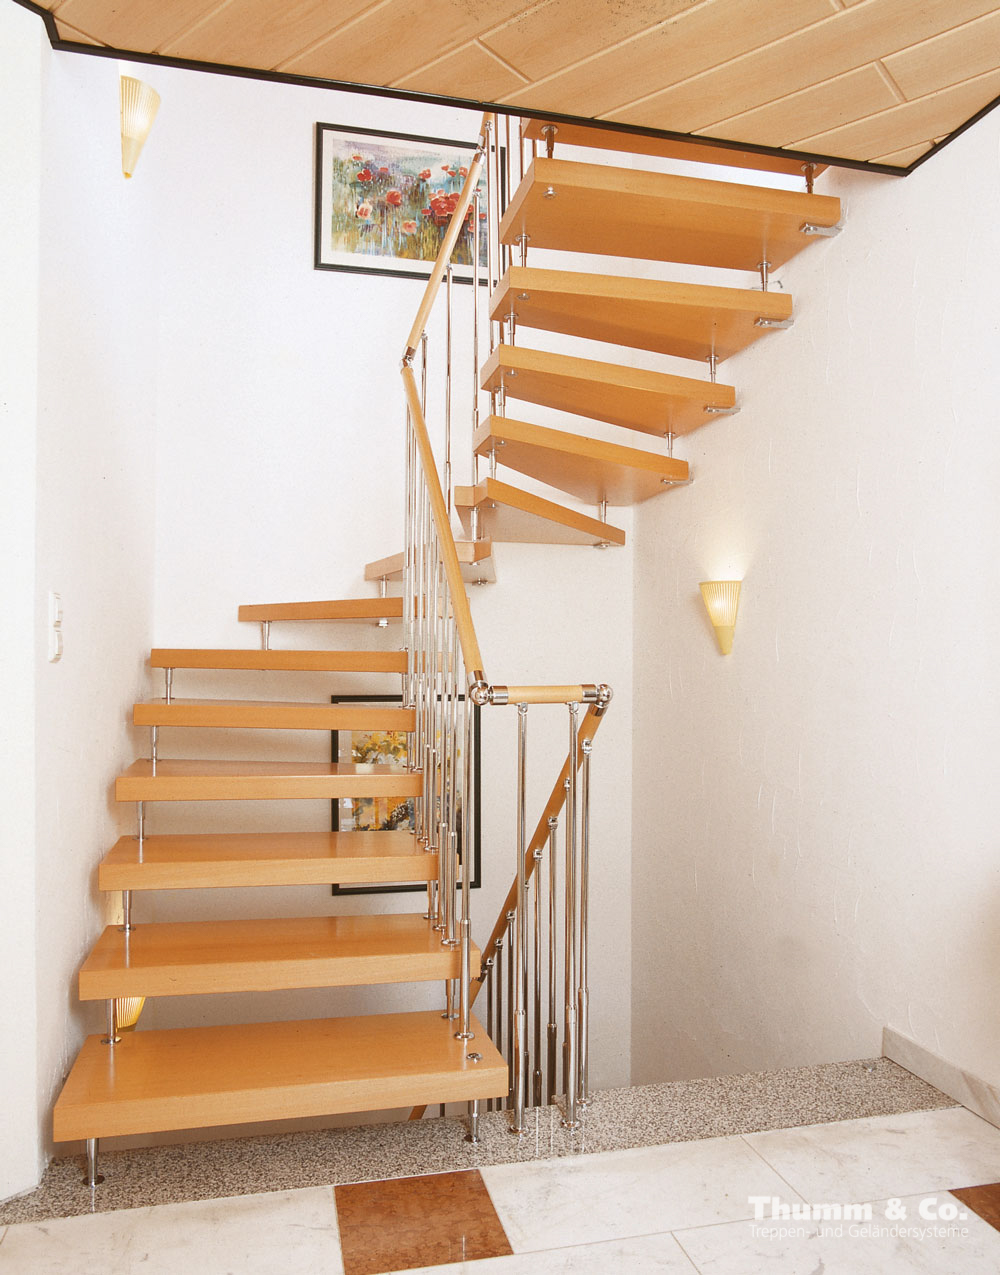 TreppenWolfi4